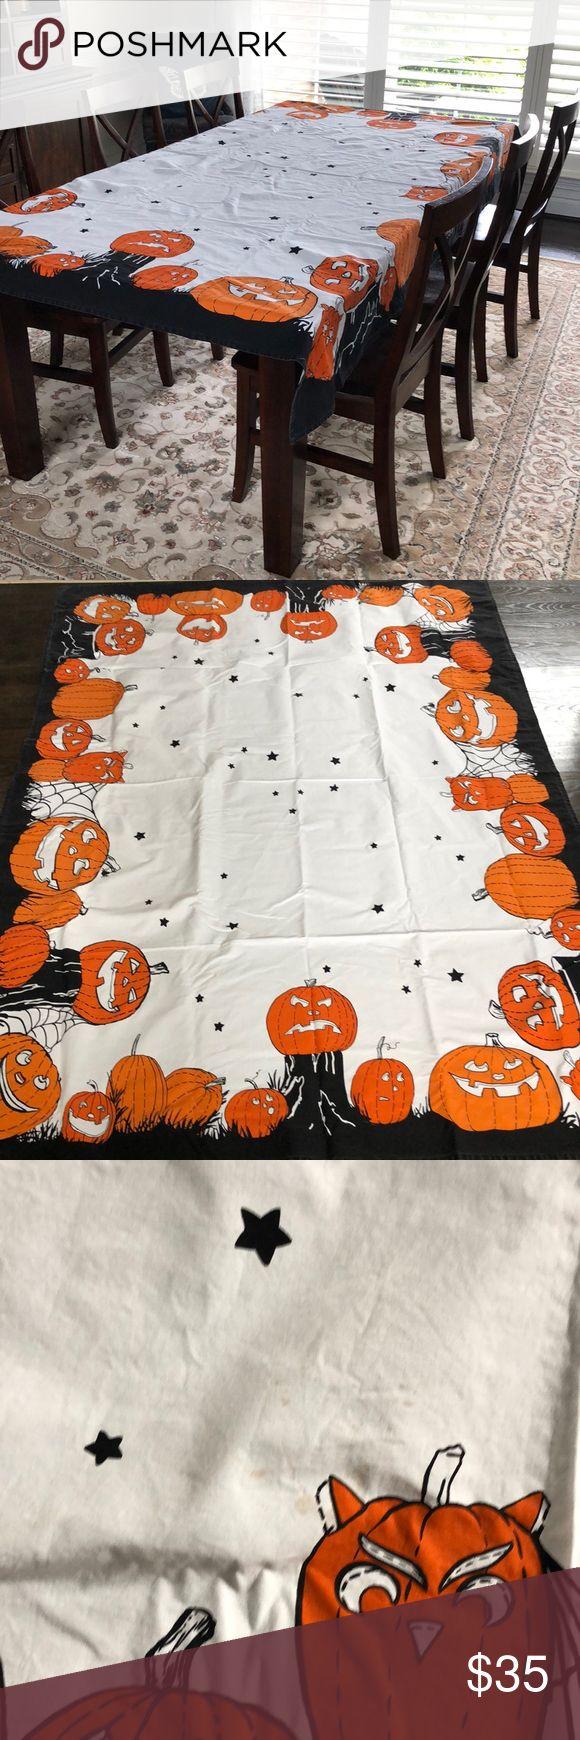 "Pottery Barn Kids Halloween table cloth 70""x90"" (With"